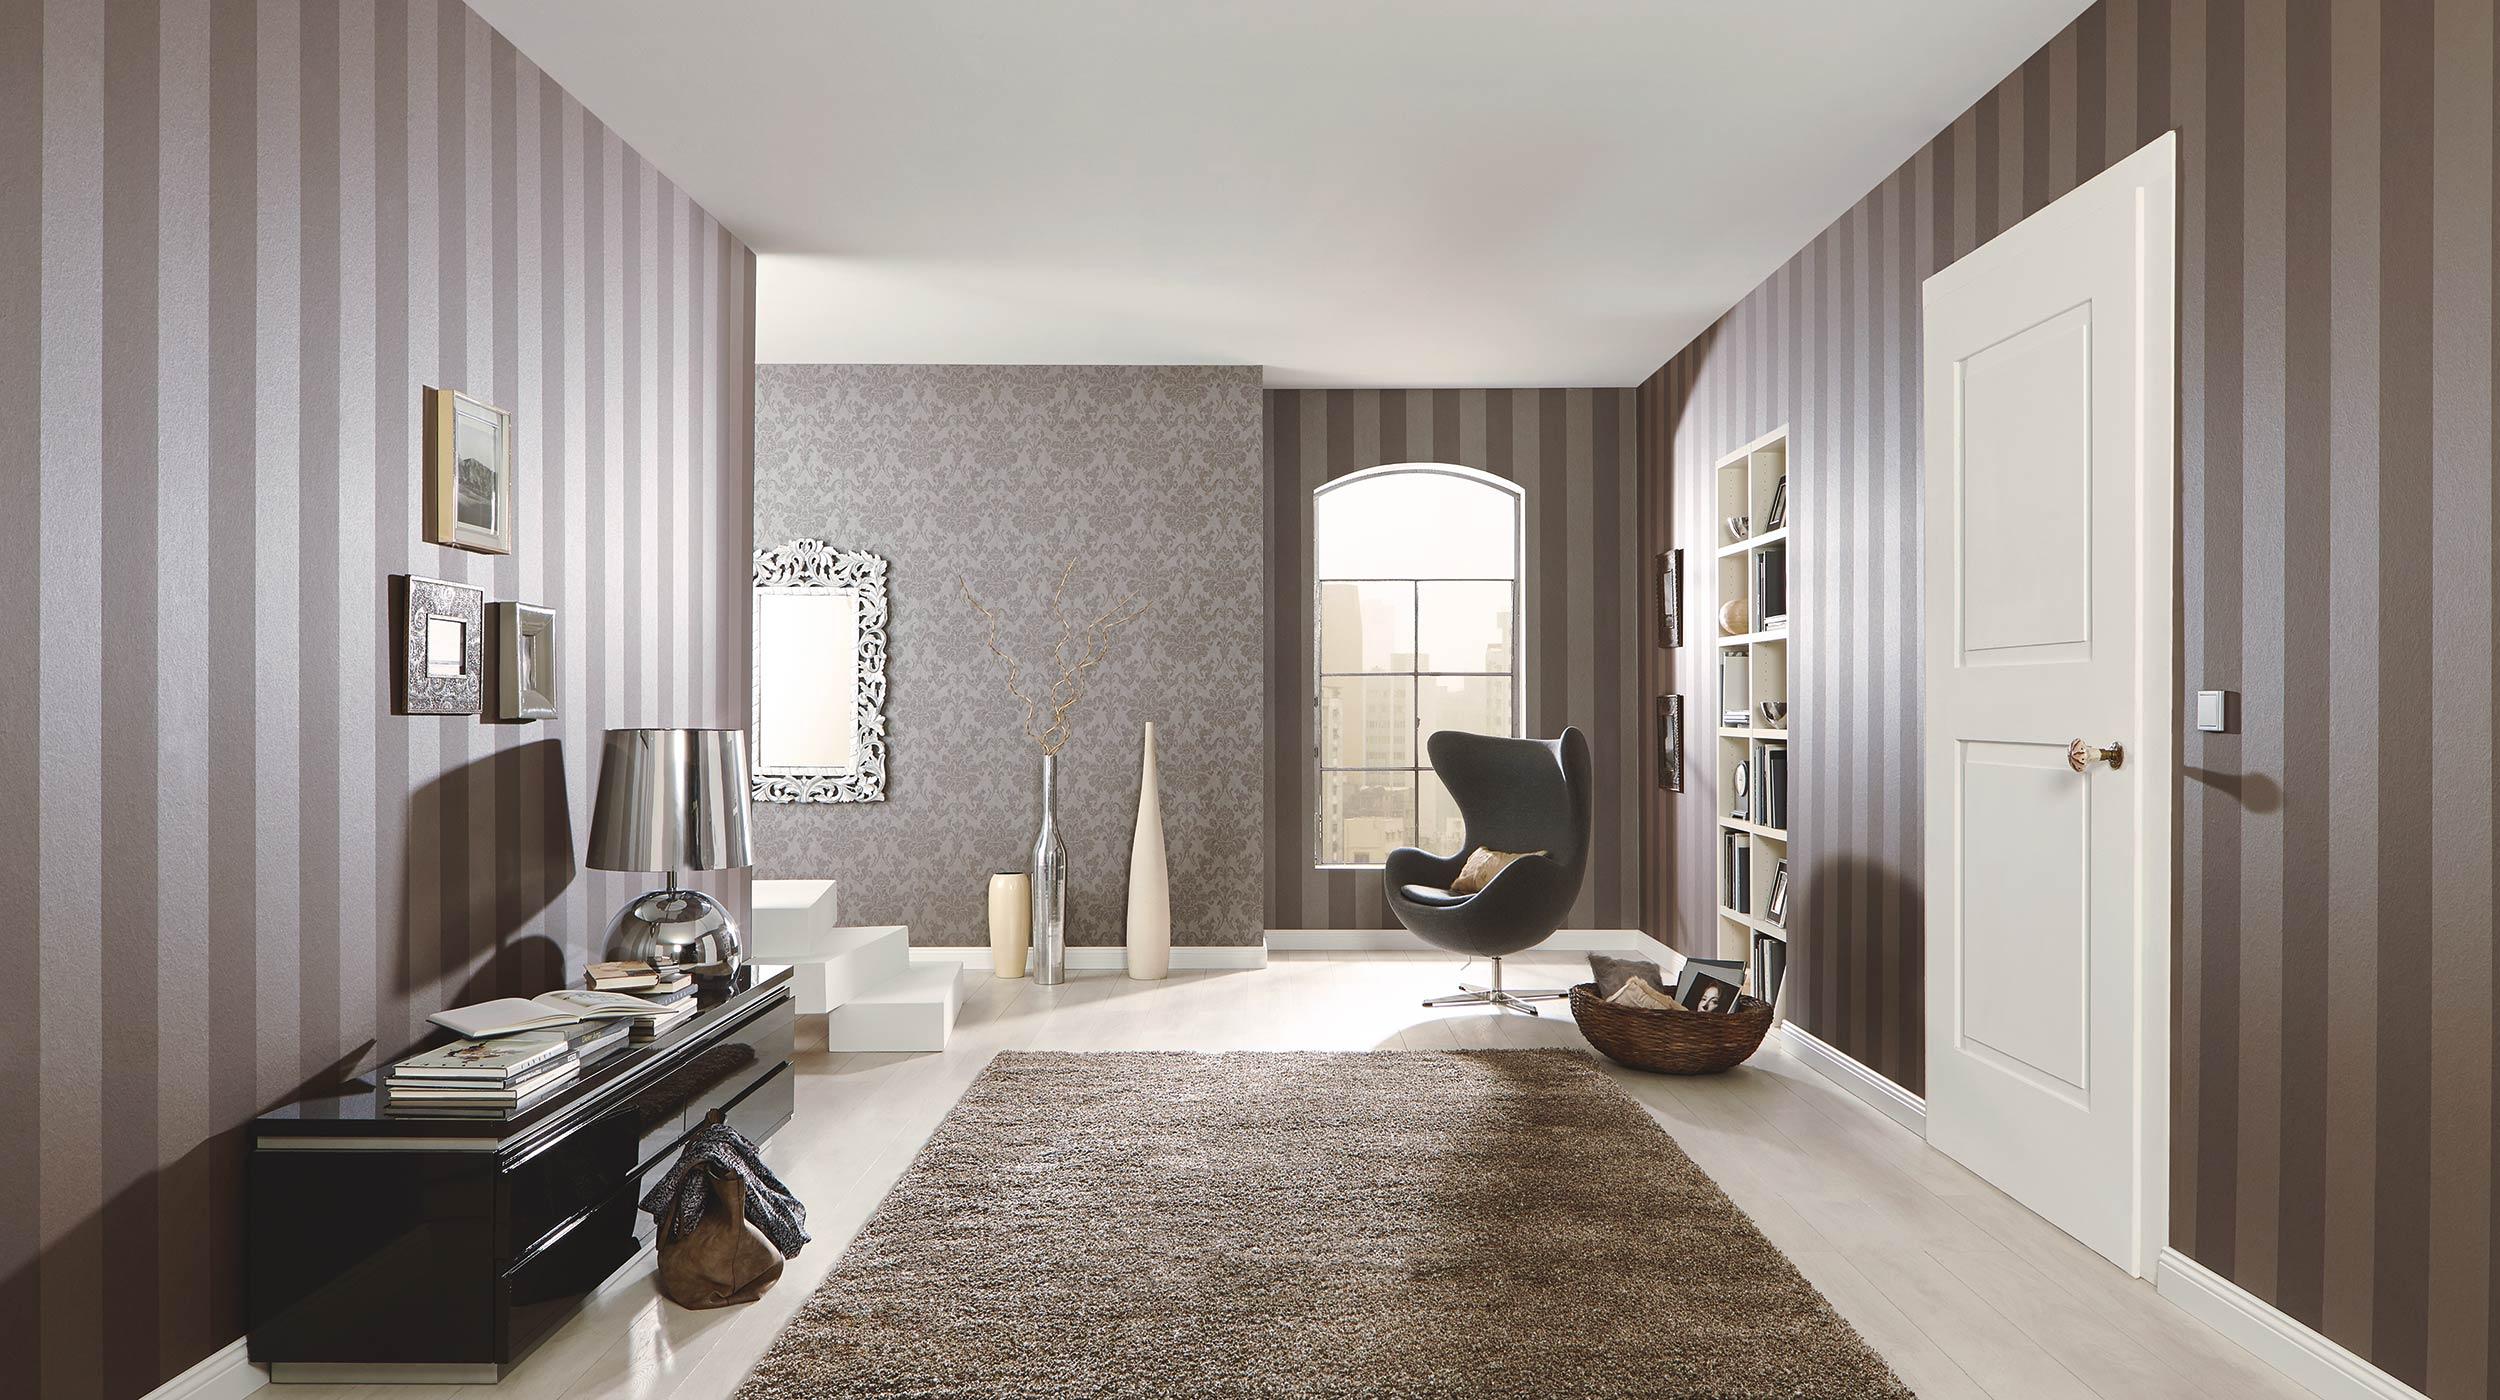 tapeten neuheiten 2017 tapeten neuheiten deutsche dekor. Black Bedroom Furniture Sets. Home Design Ideas